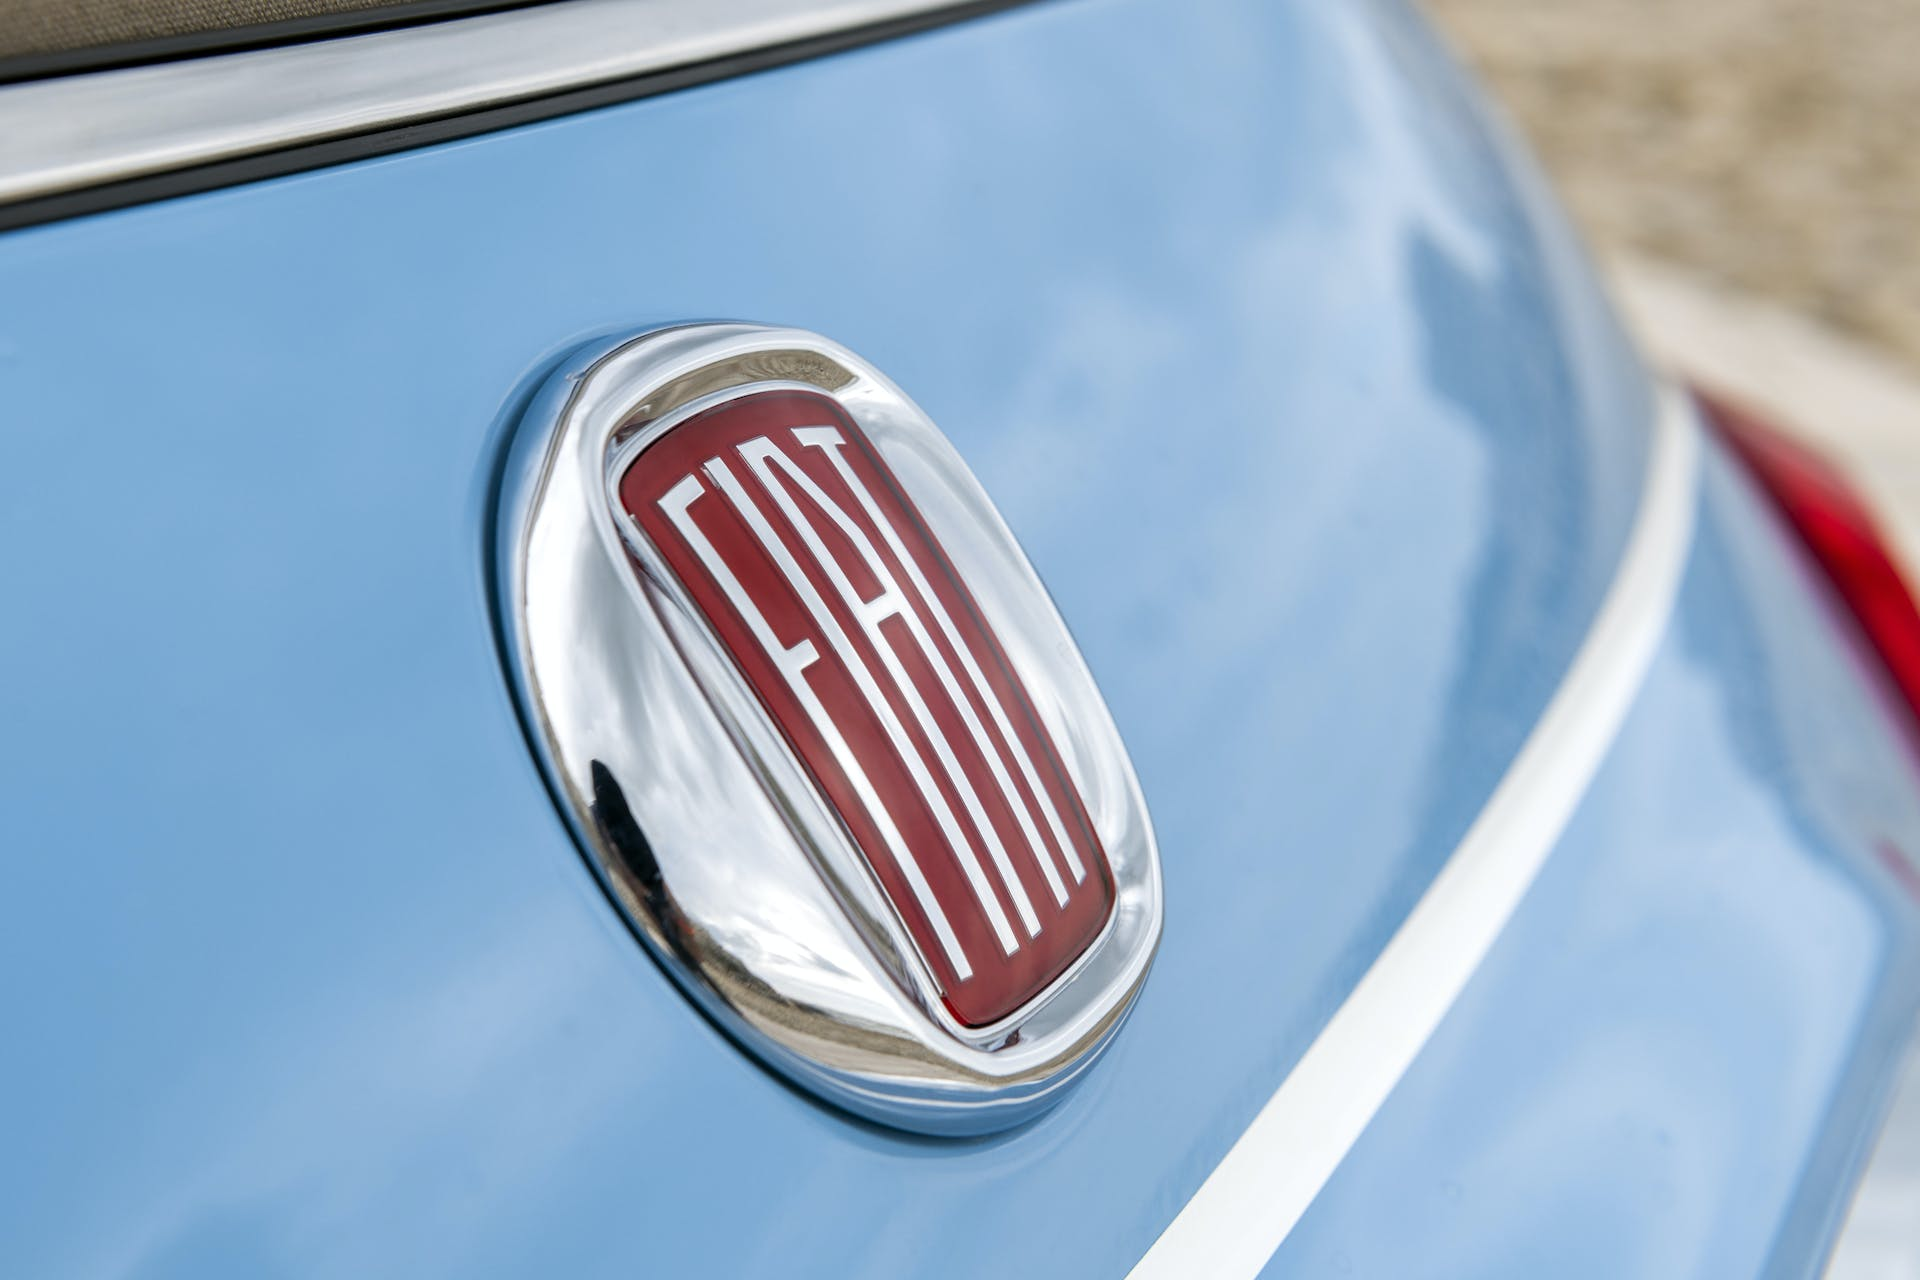 Fiat 500 Spiaggina '58 stemma vintage